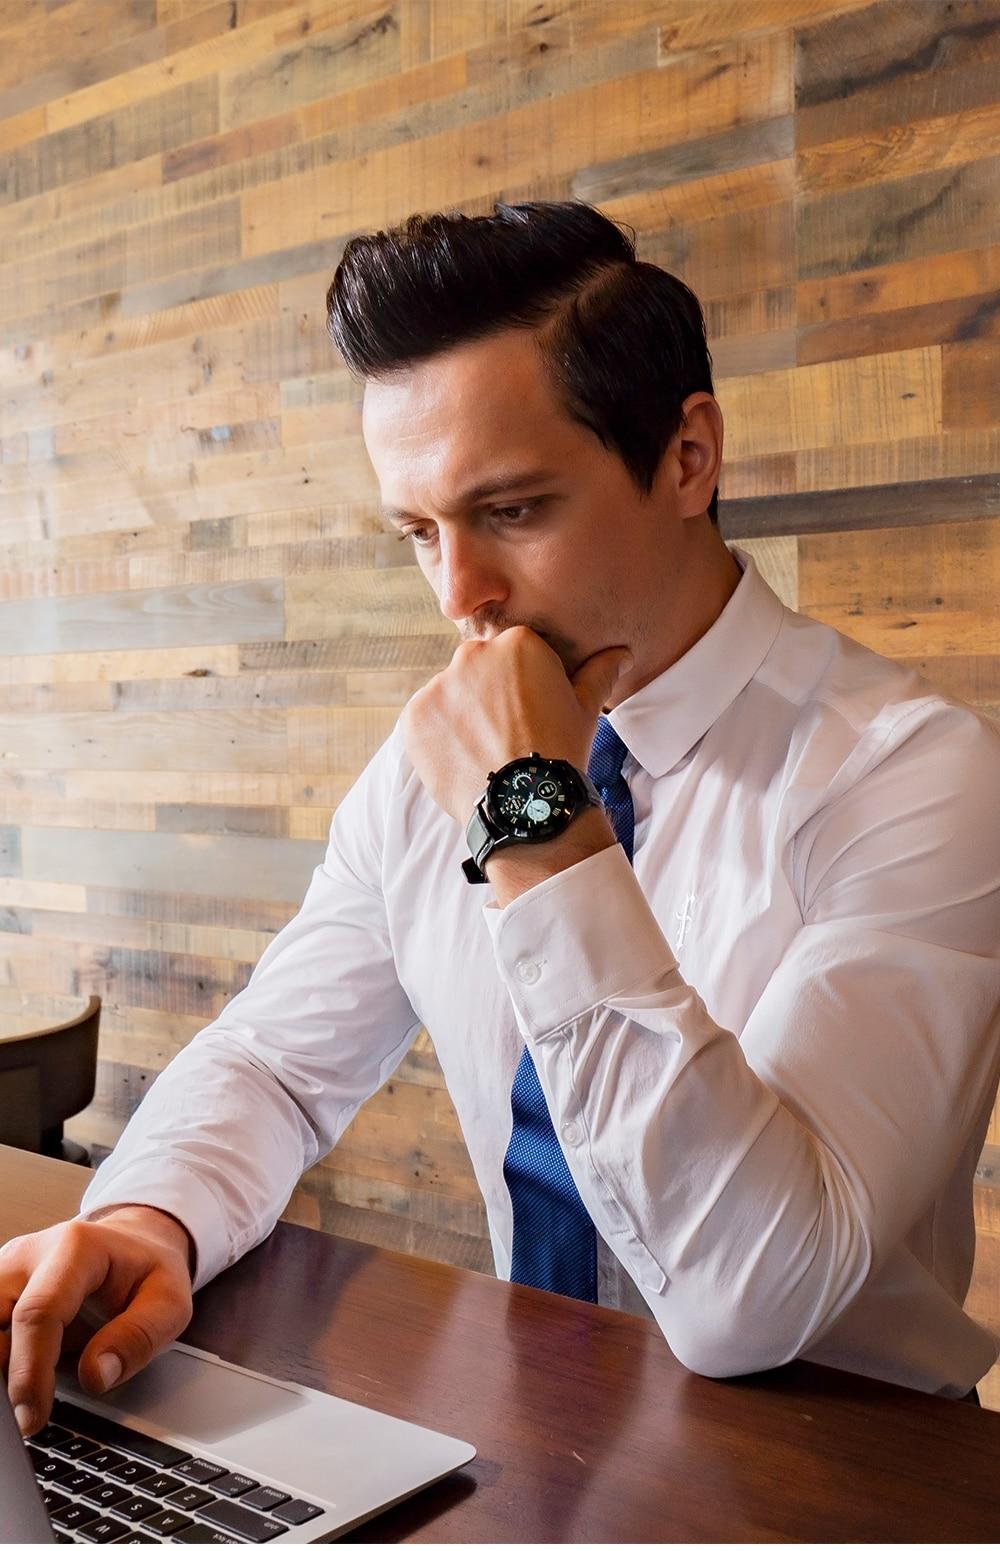 Hdd587dc448024e0da4417372257681458 2021 SANLEPUS ECG Smart Watch Dial Call Smartwatch Men Sport Fitness Bracelet Clock Watches For Android Apple Xiaomi